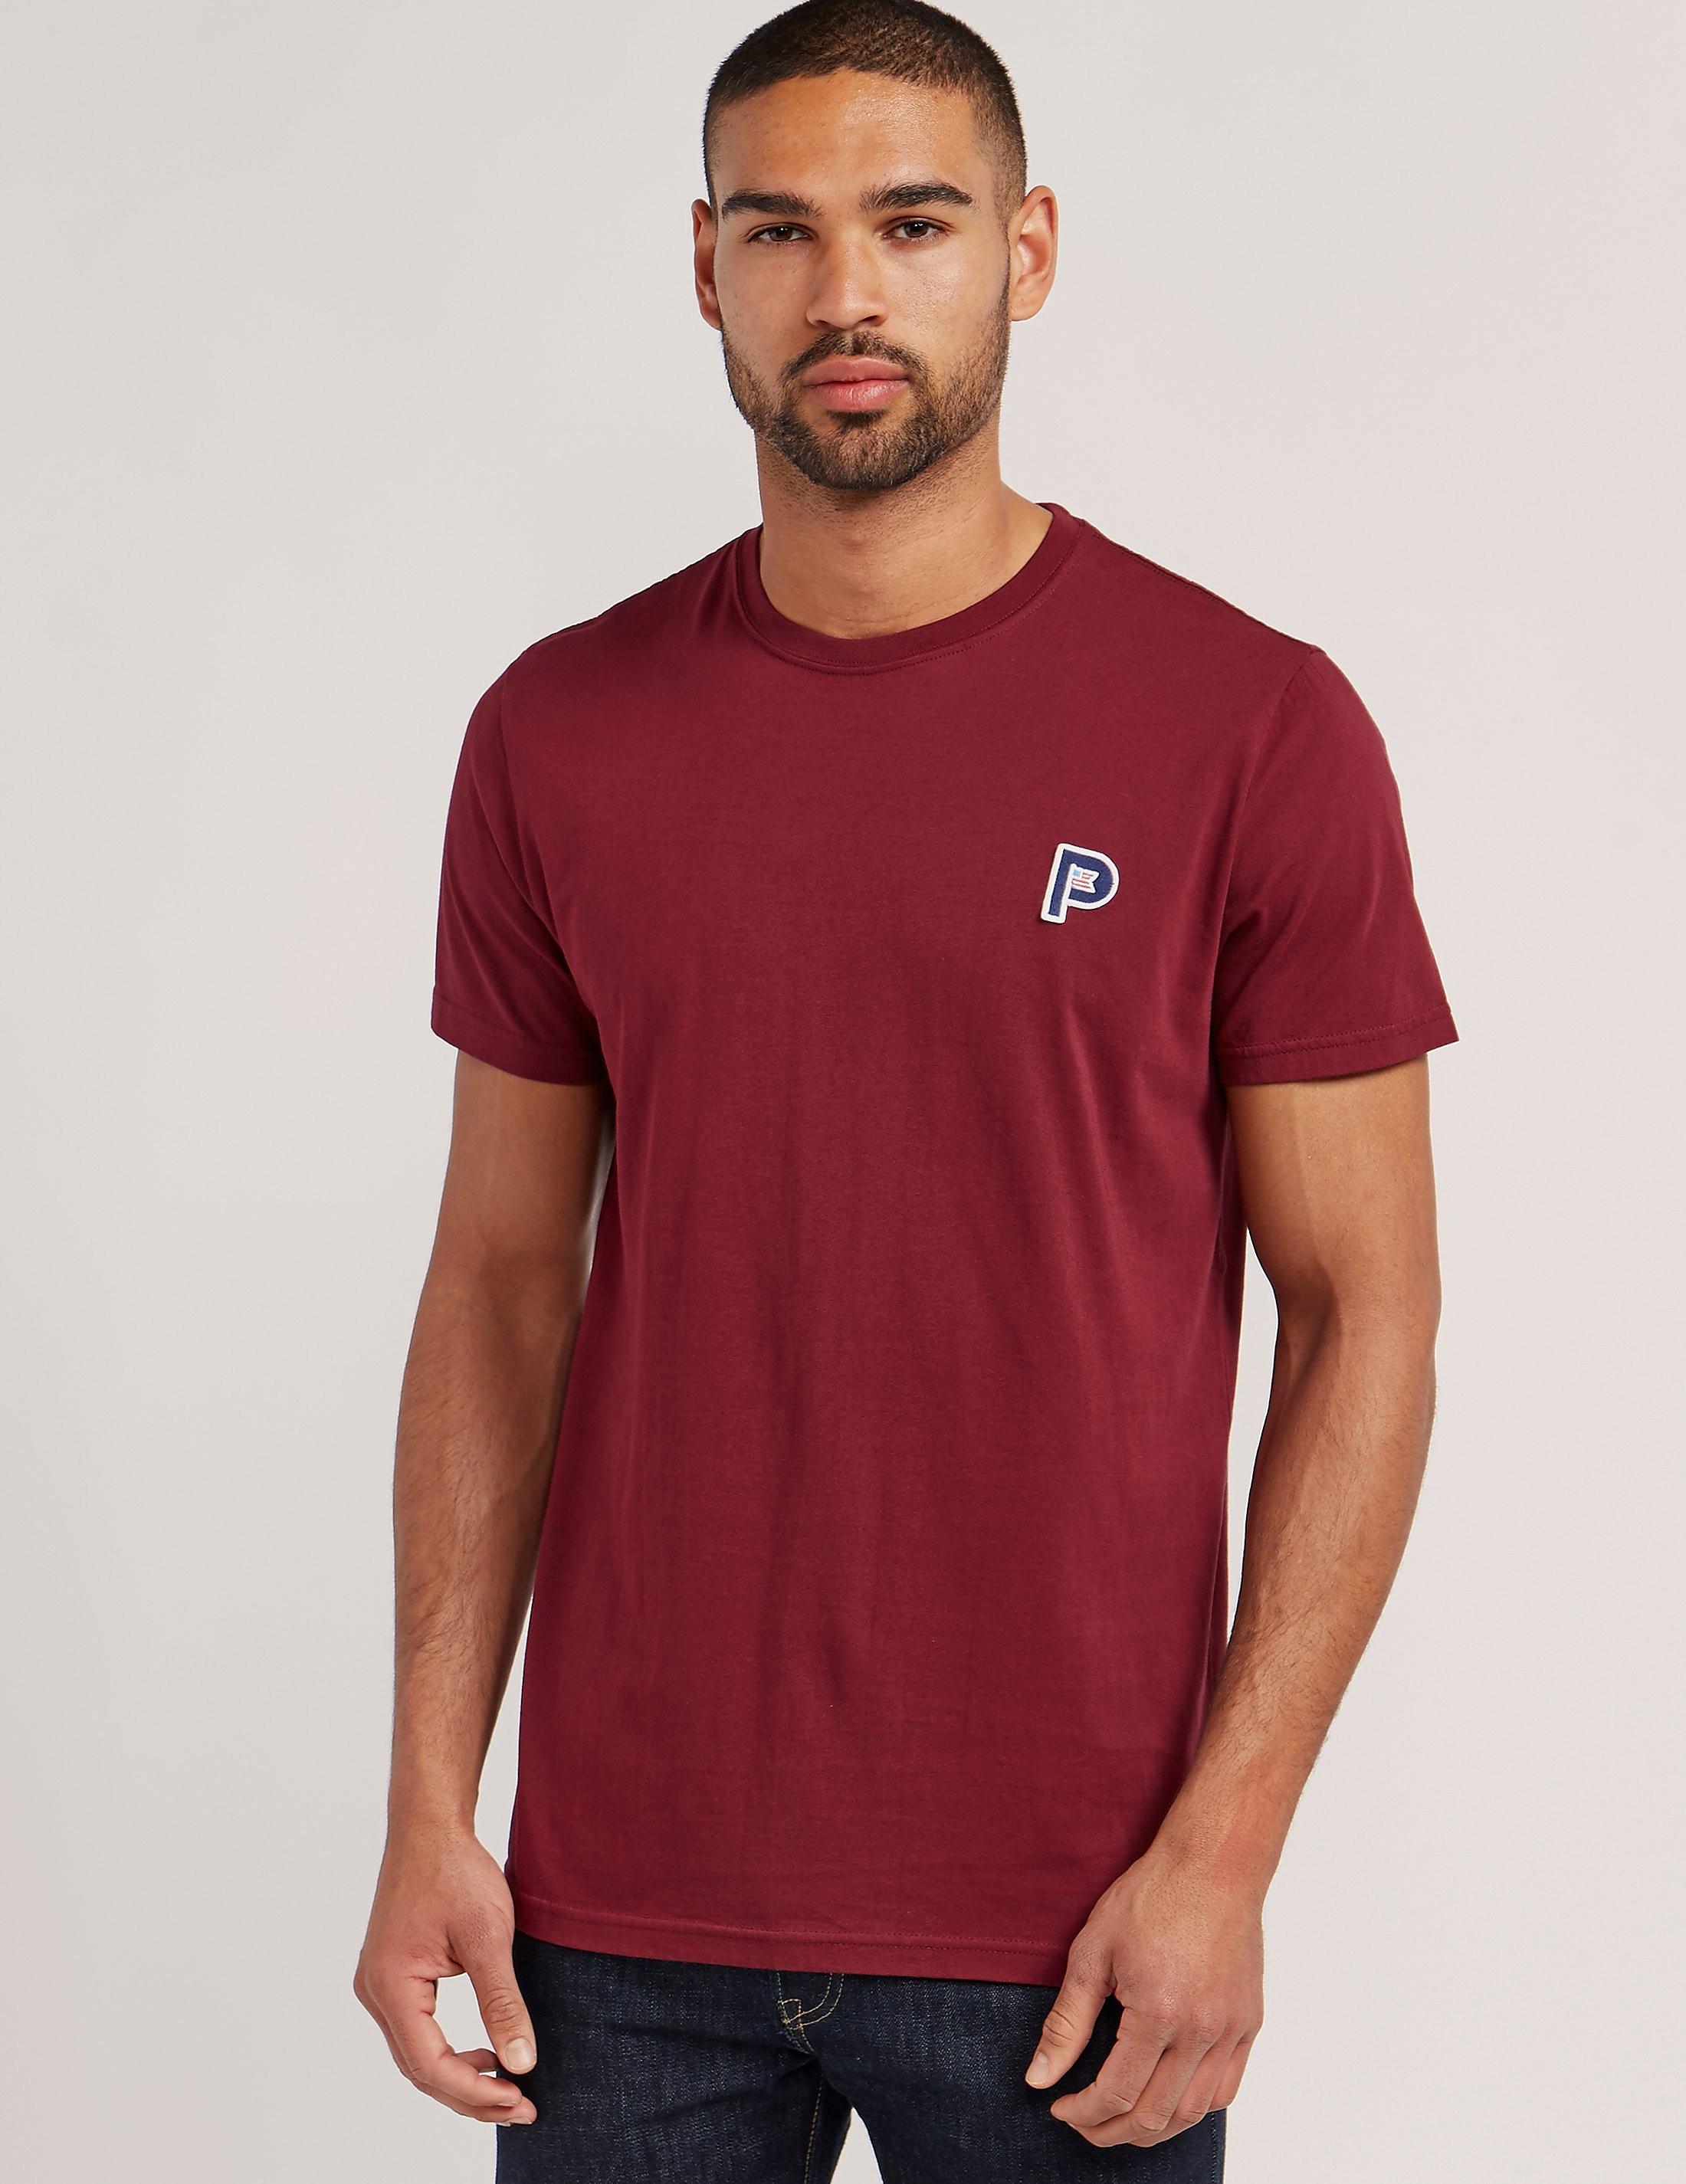 Penfield Perris Logo Short Sleeve T-Shirt